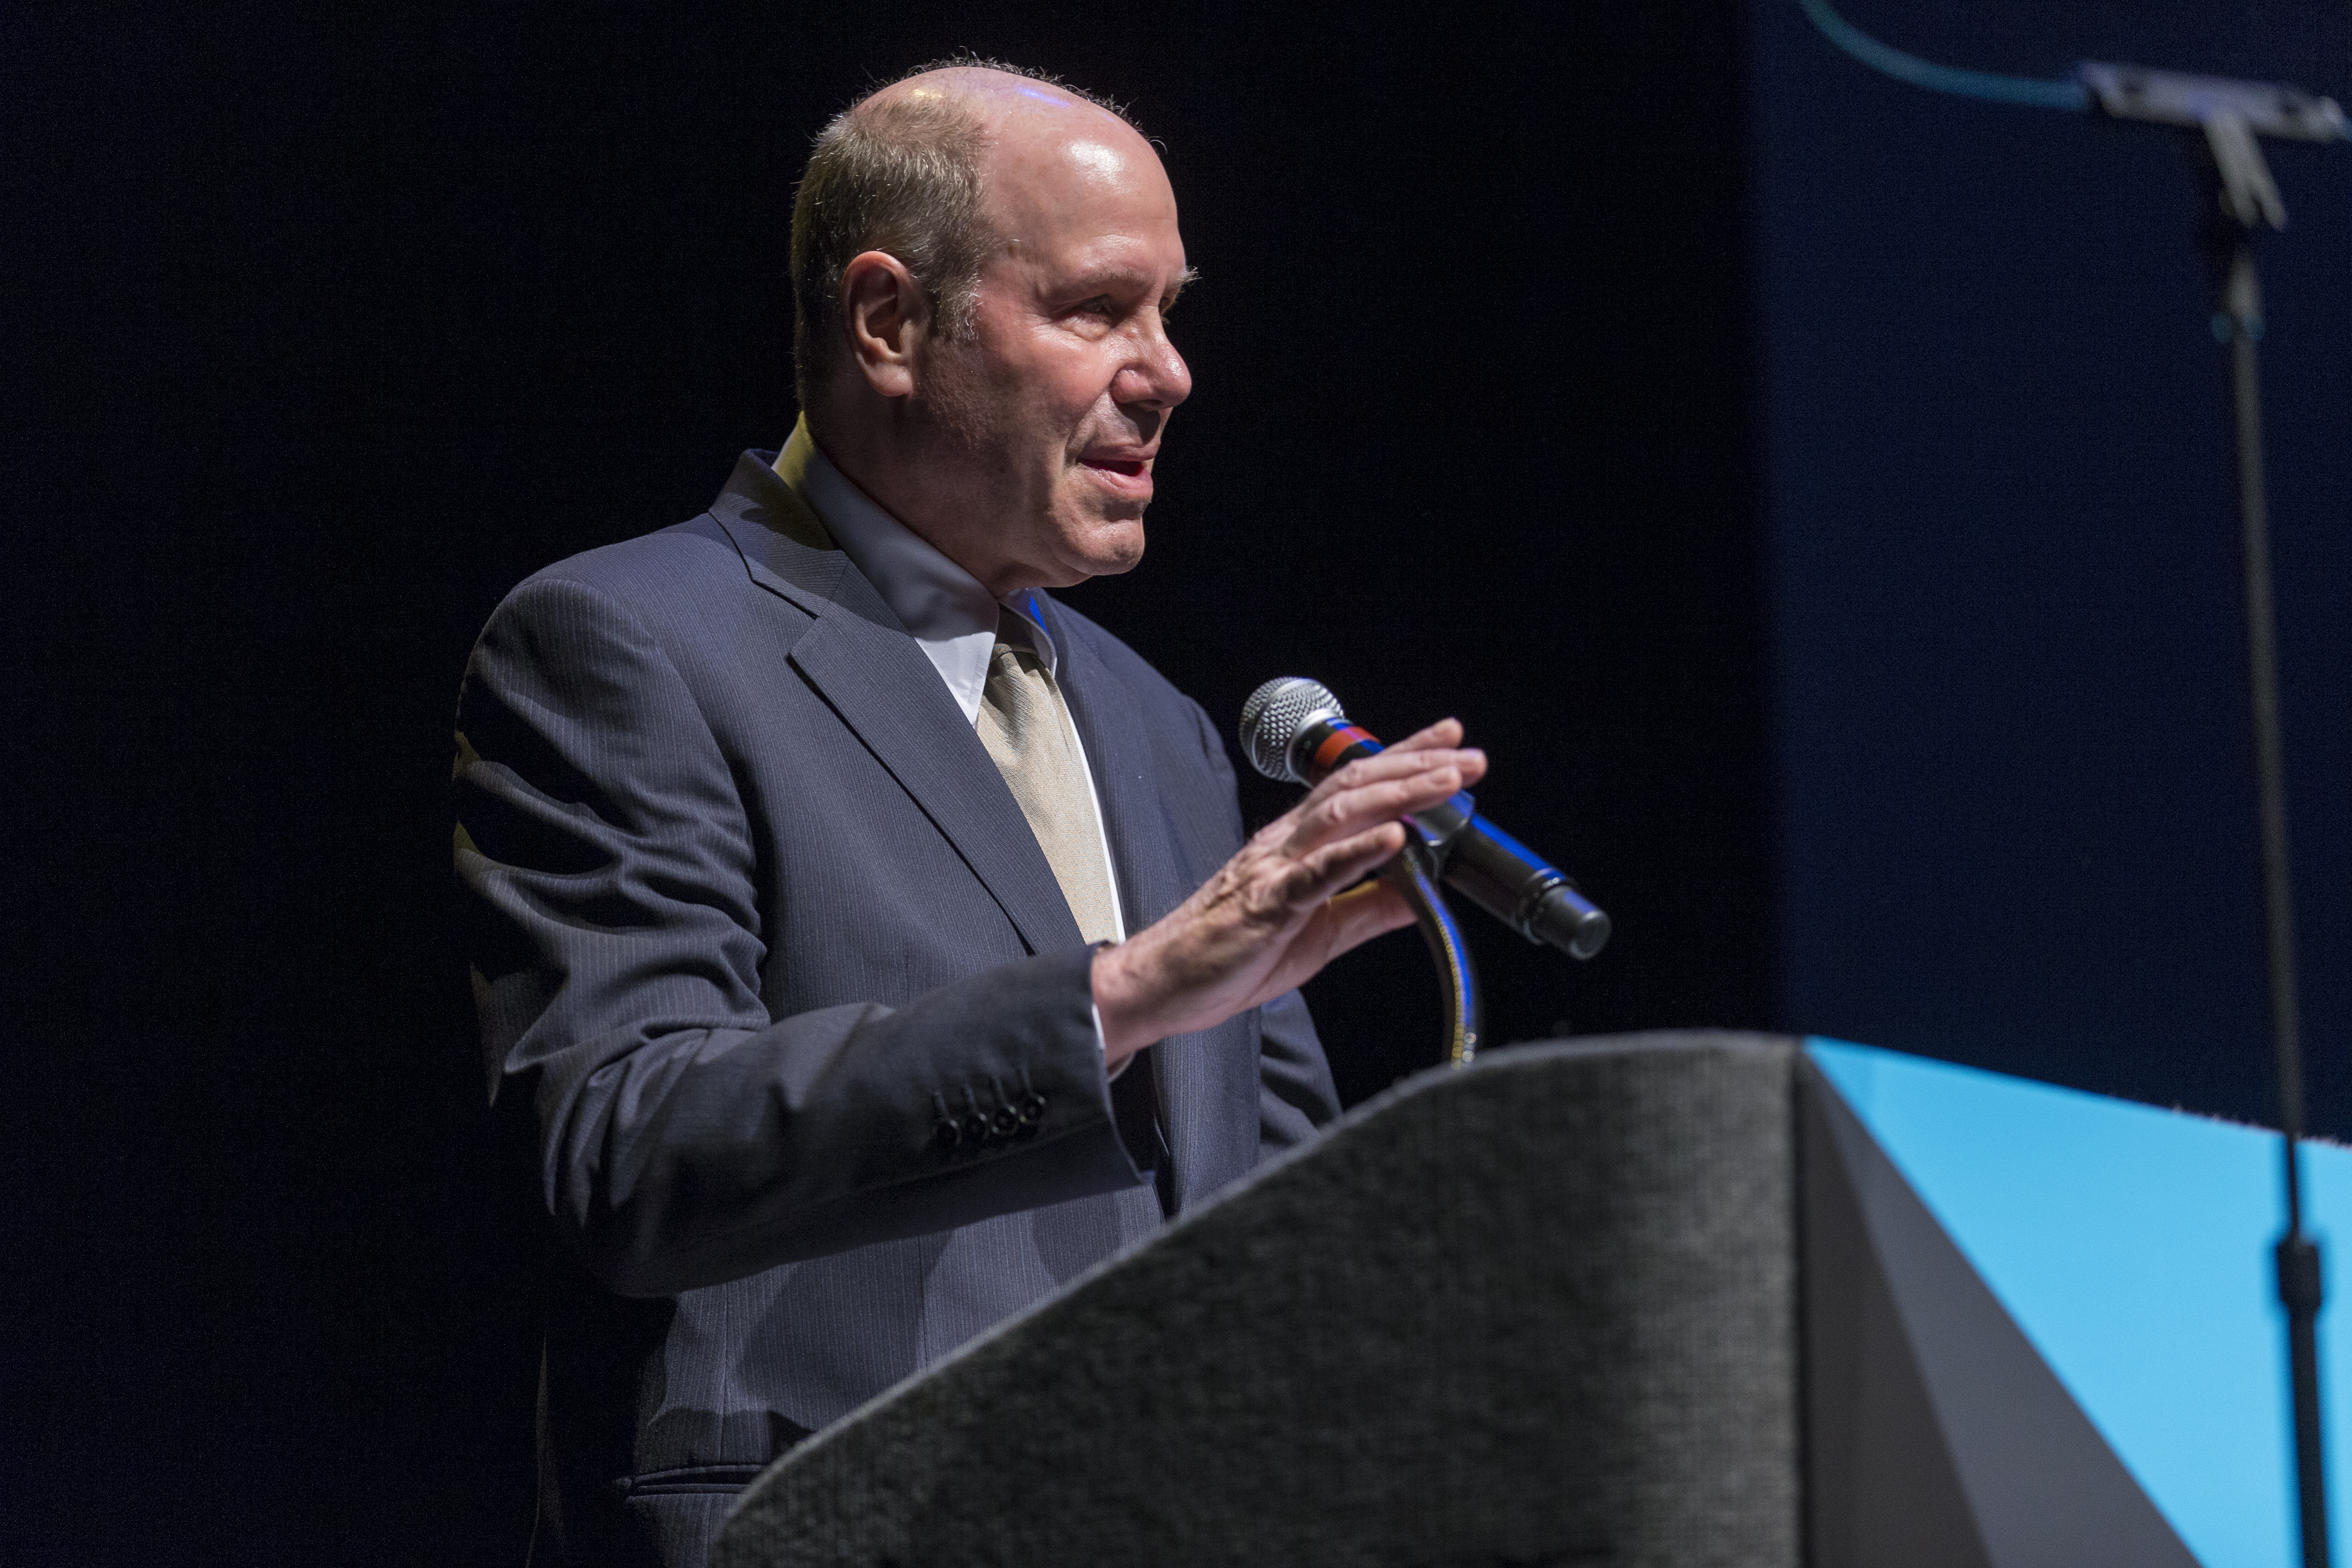 RCLA present Michael Eisner speaking at Van Wezel Performing Arts Hall in Sarasota --Photo by Rod Millington